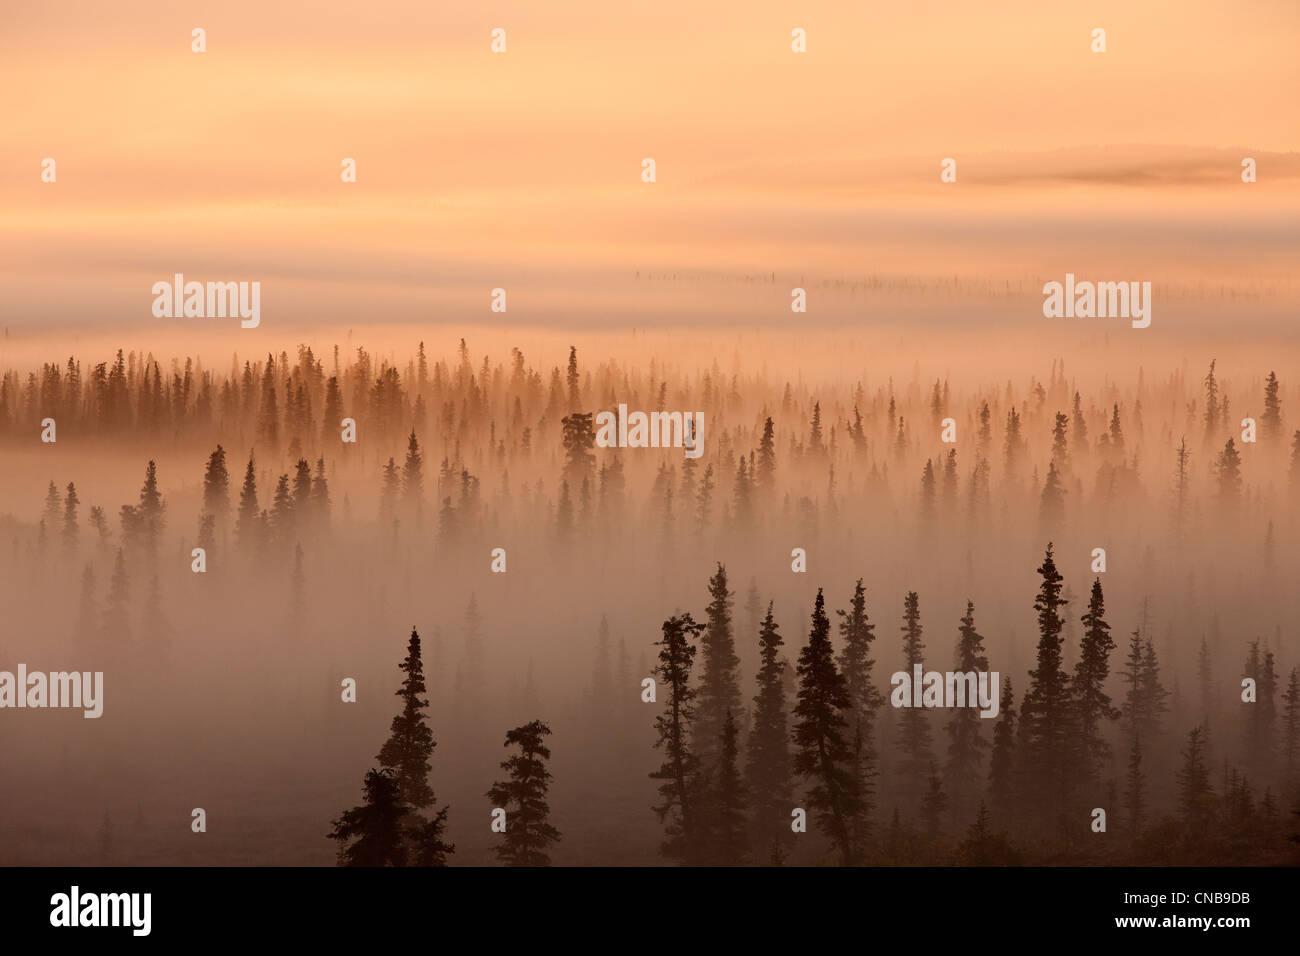 Sonnenaufgang über dem nebligen Wald, Katmai National Park and Preserve, Südwest-Alaska, Herbst Stockbild